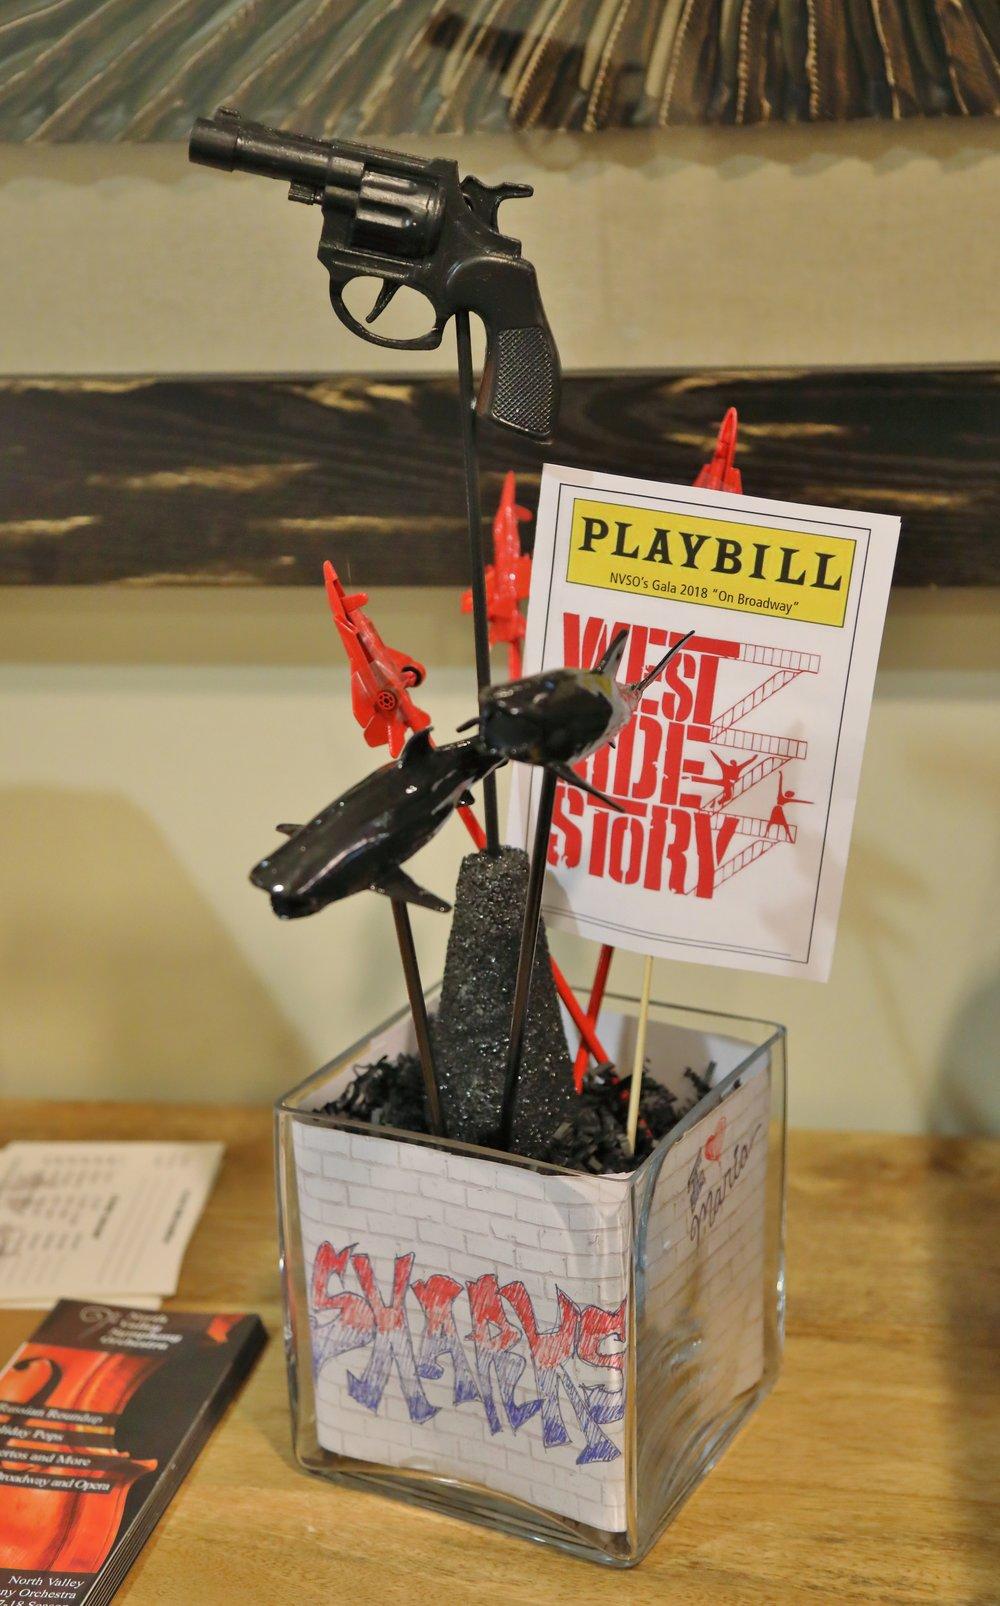 Centerpiece West Side Story.jpg